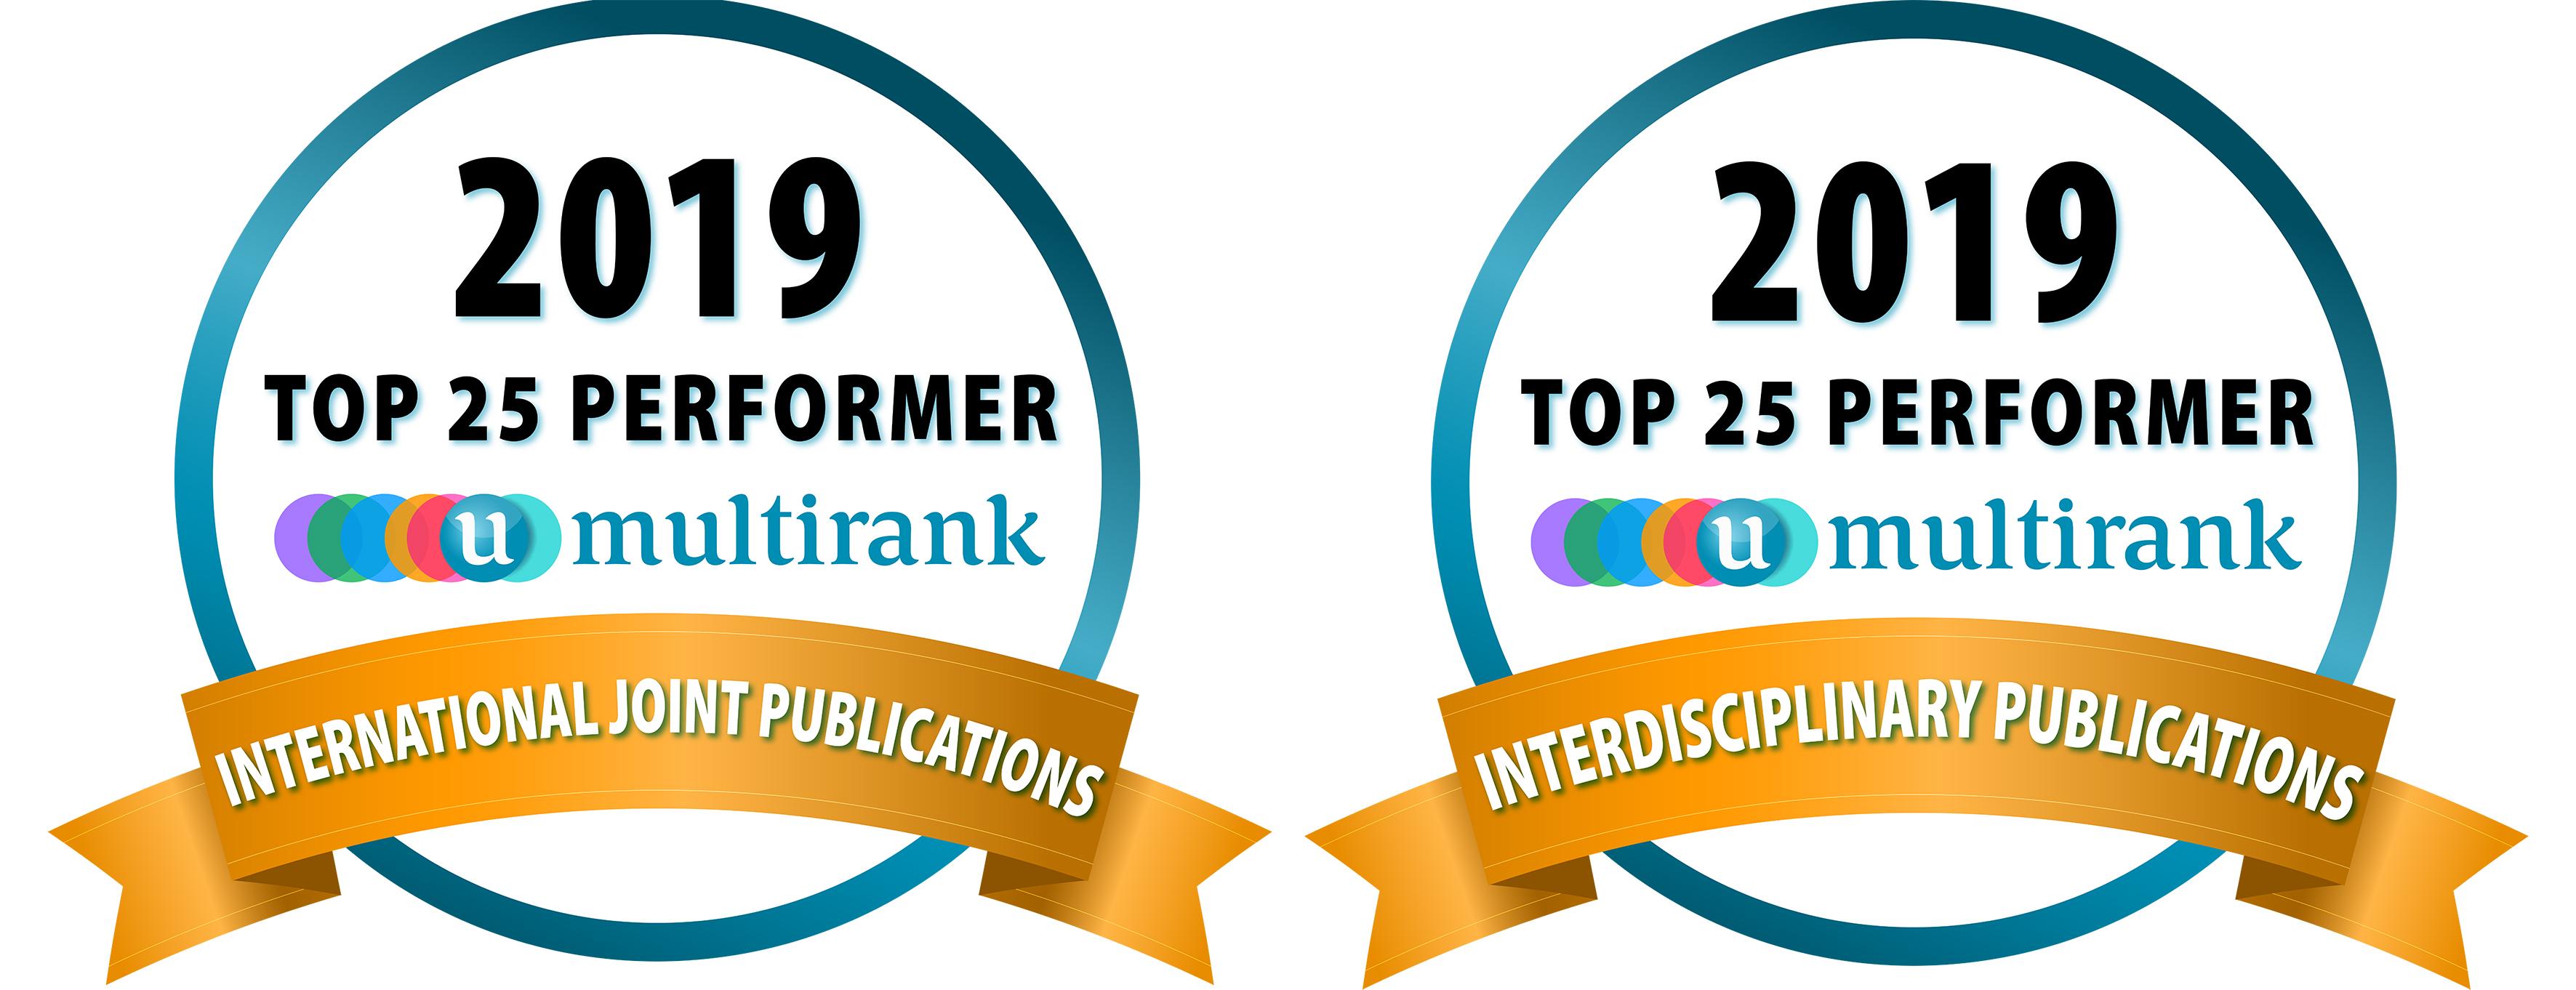 Yachay Tech University in top 25